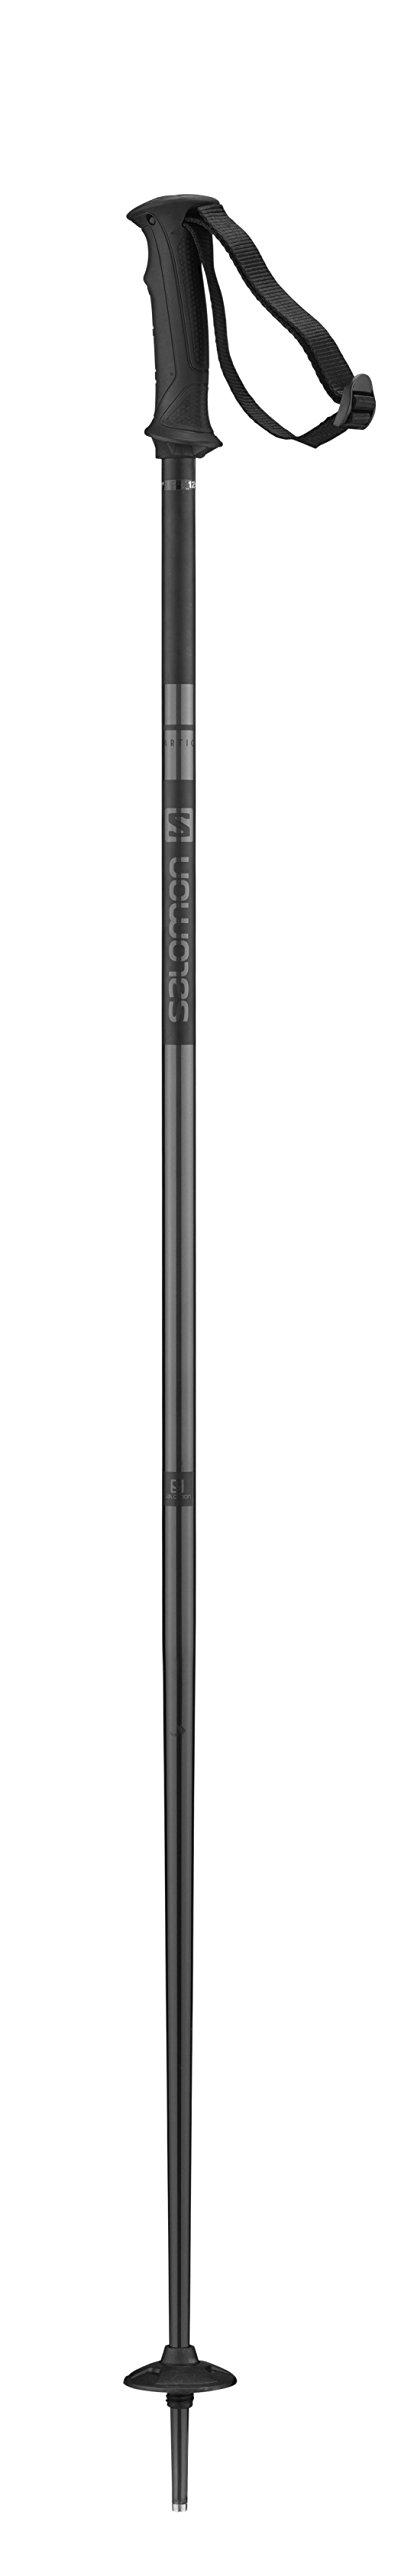 Salomon Arctic, 130, Black by Salomon